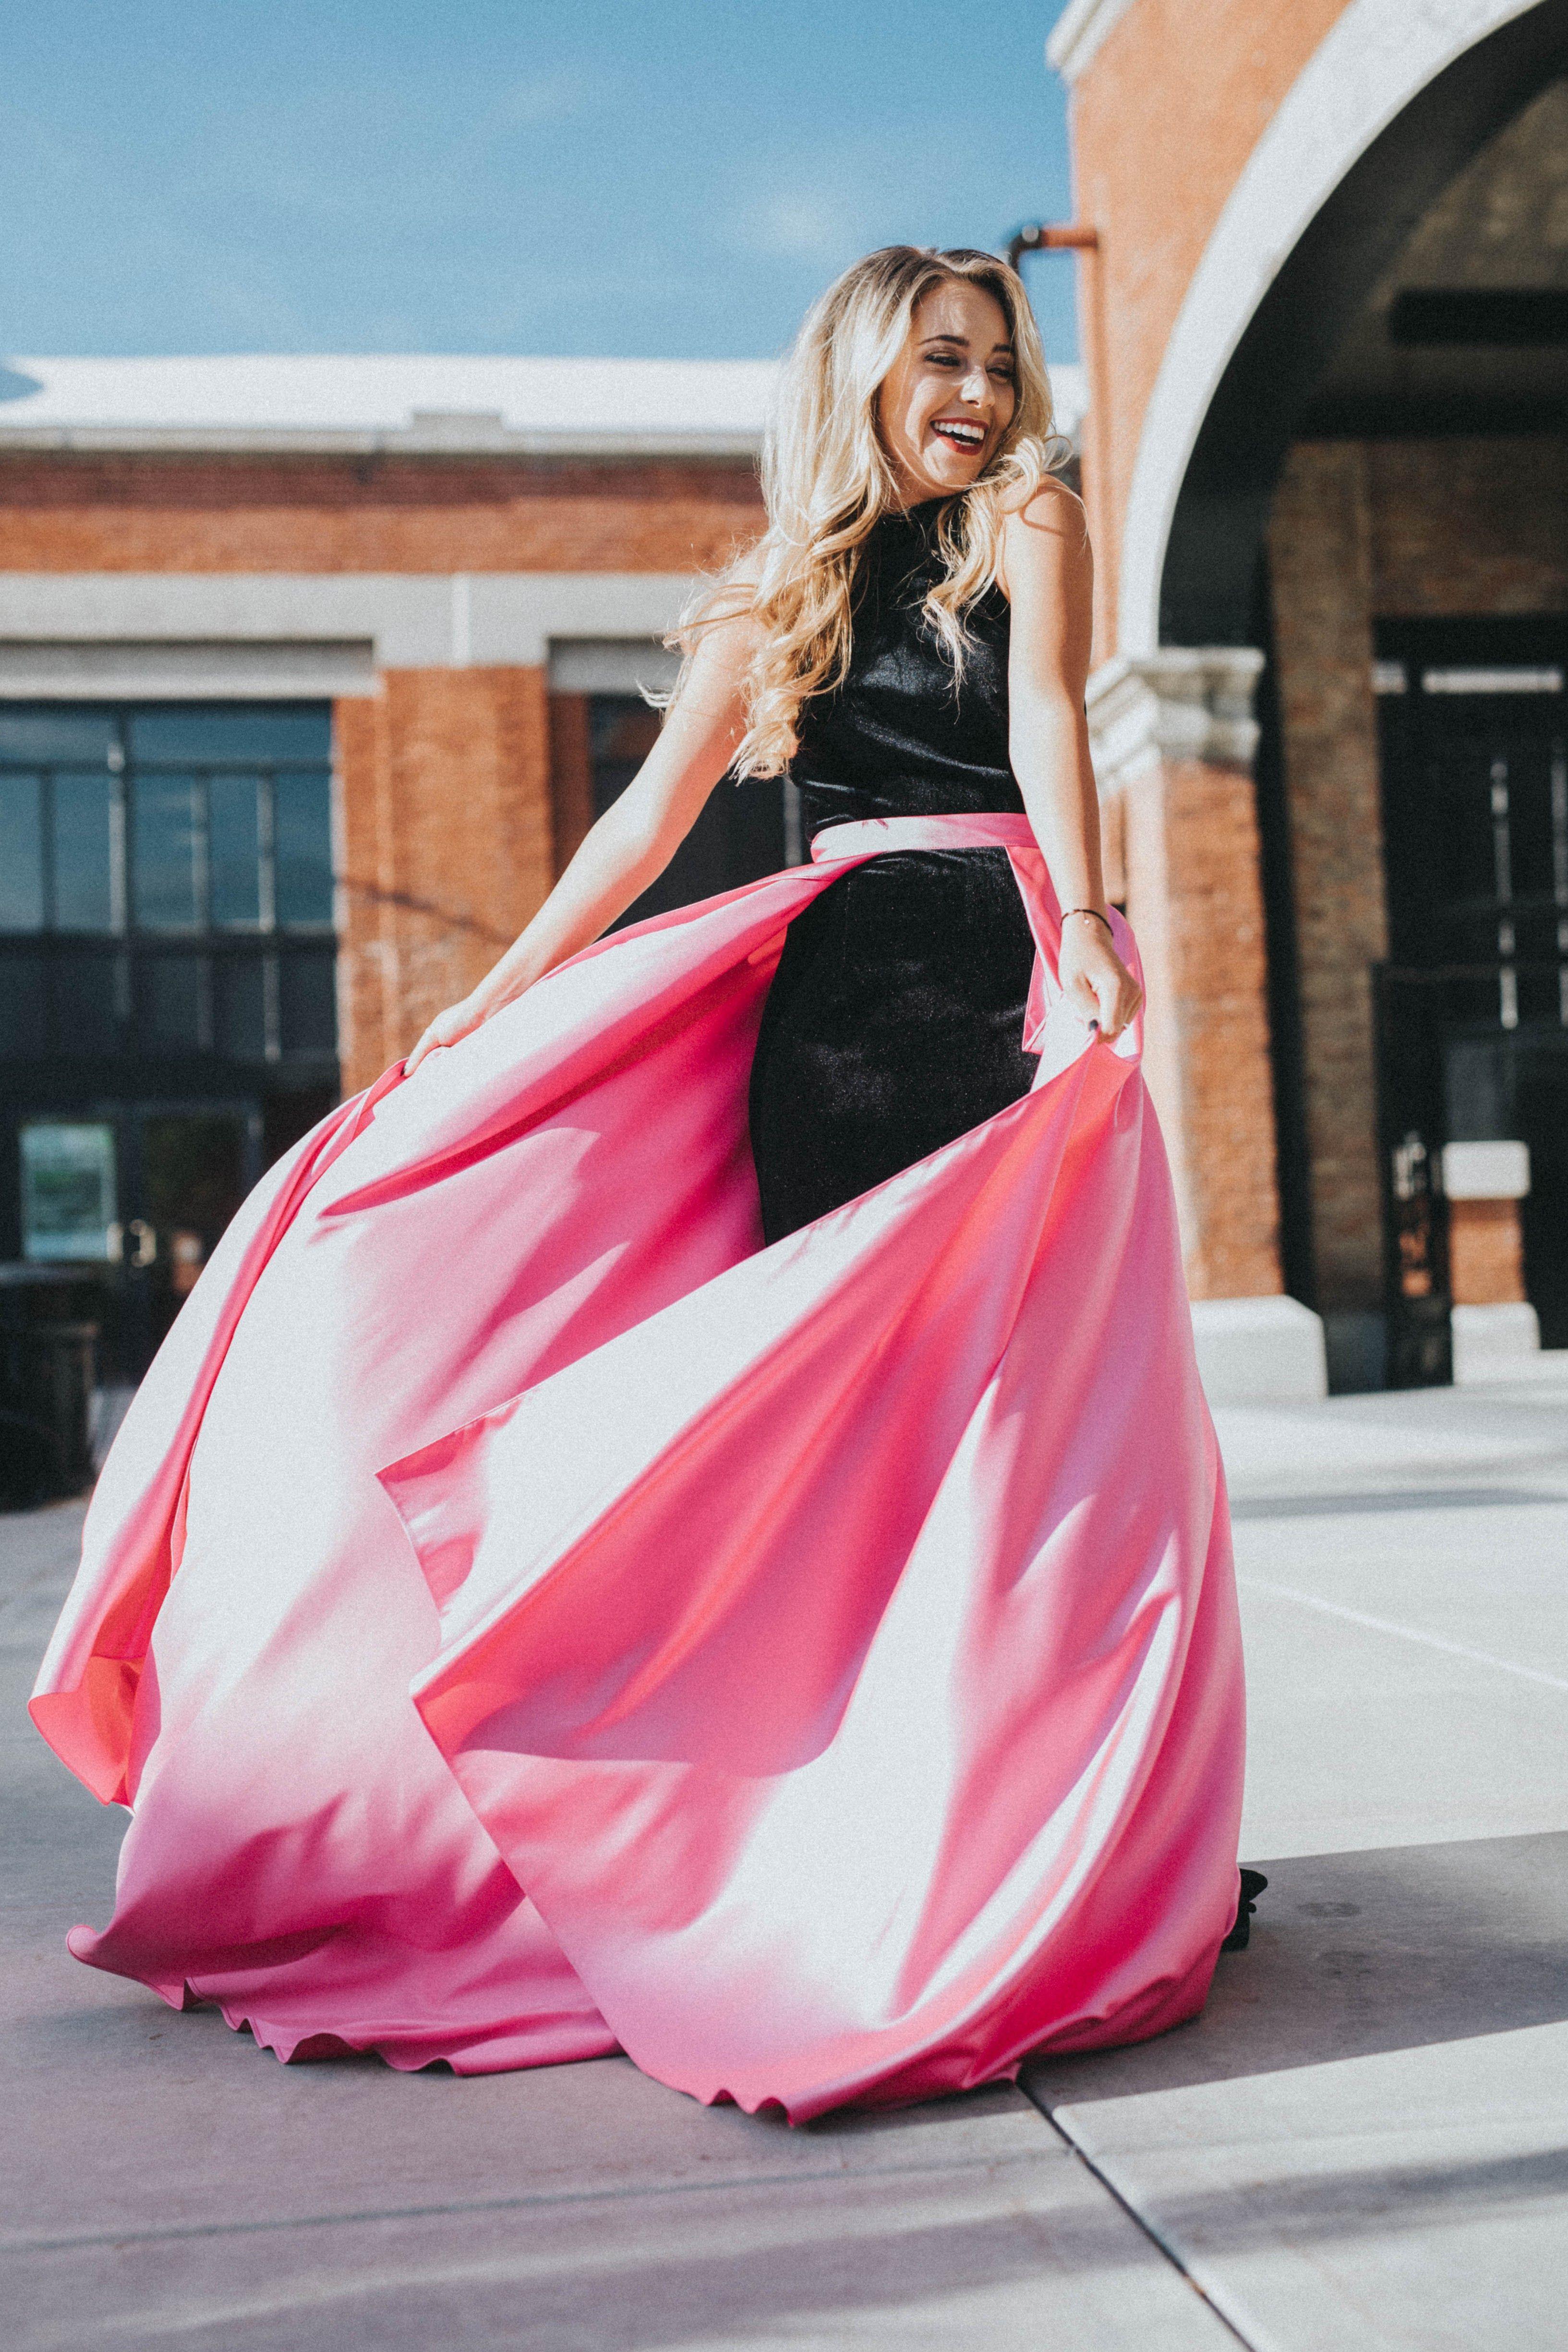 JOVANI Black and Pink YPSILON DRESSES 2 Piece Detachable Skirt Black ...